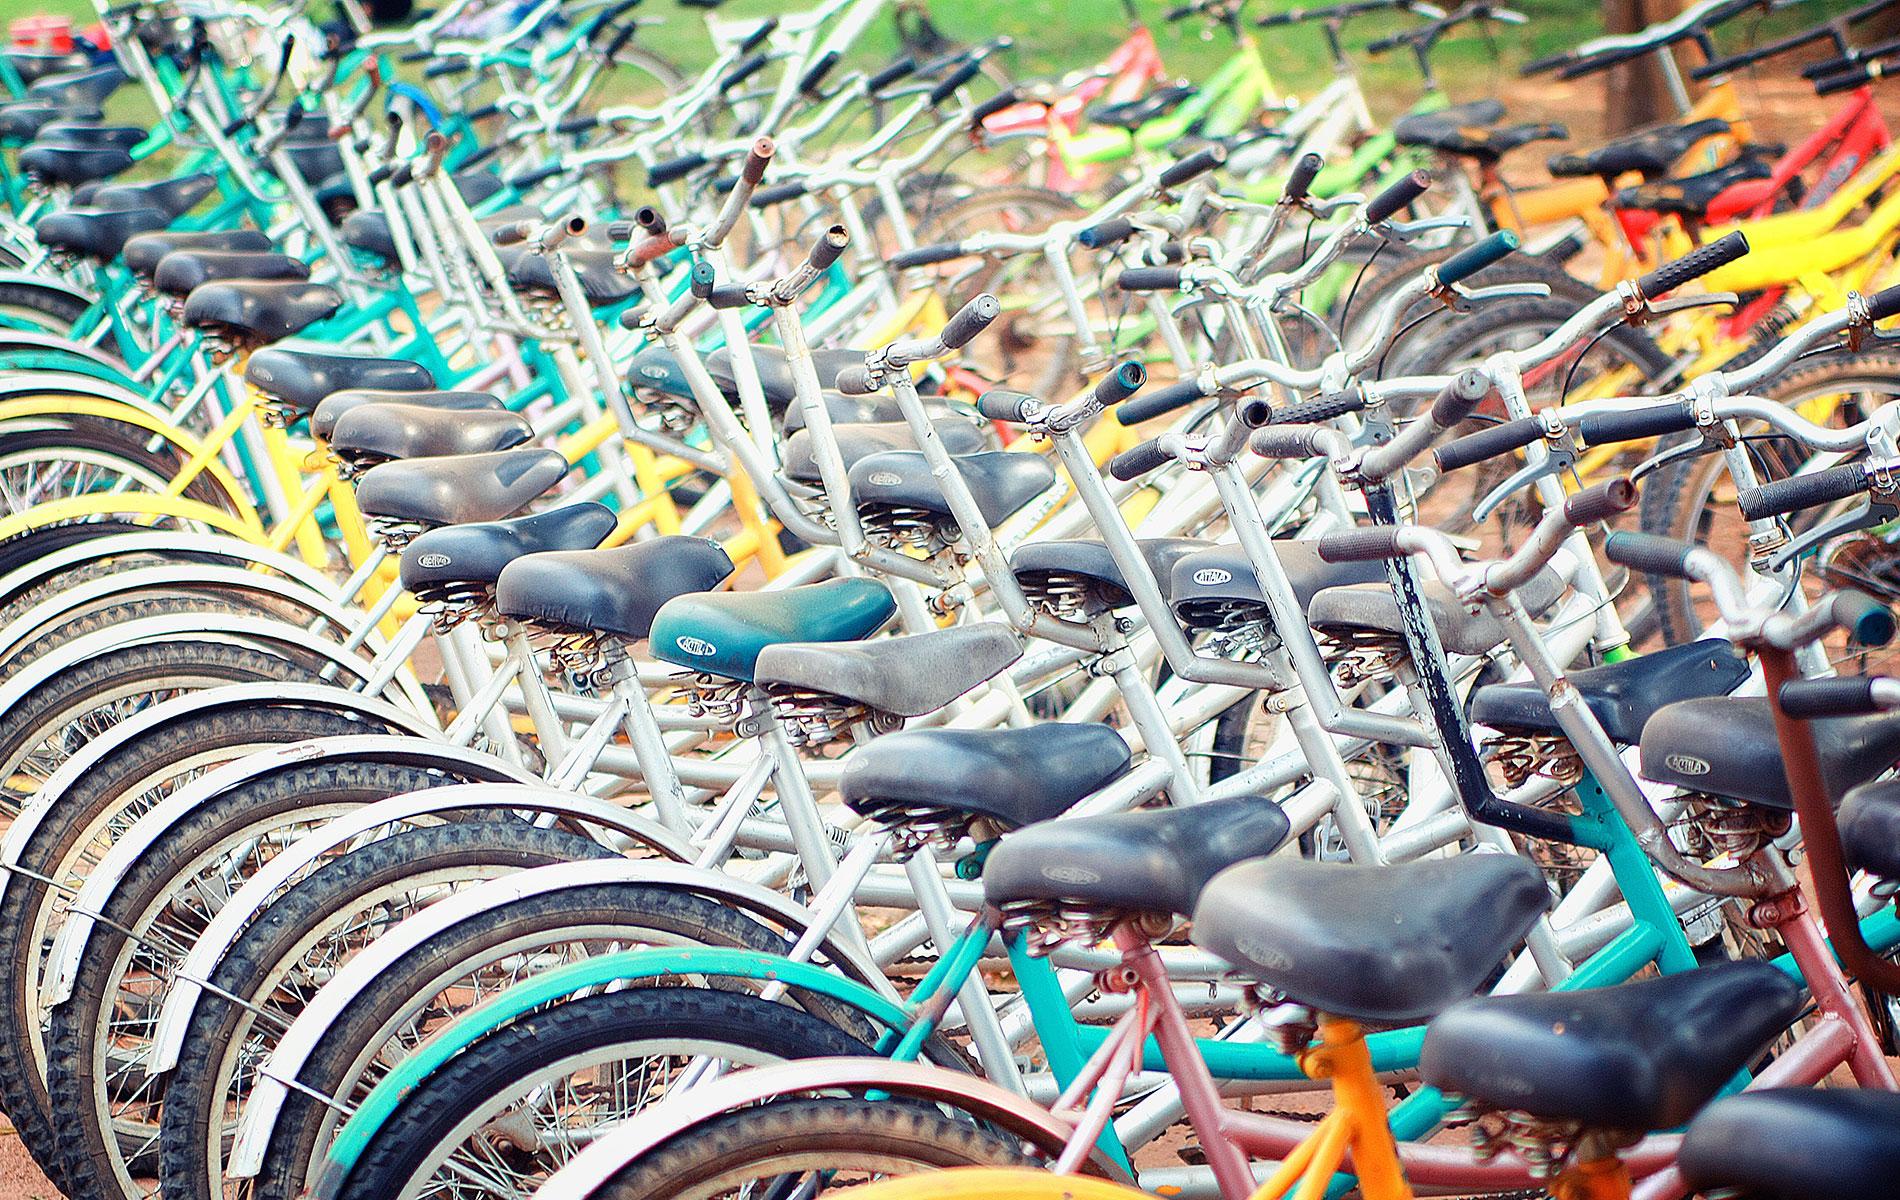 Biciklikölcsönző